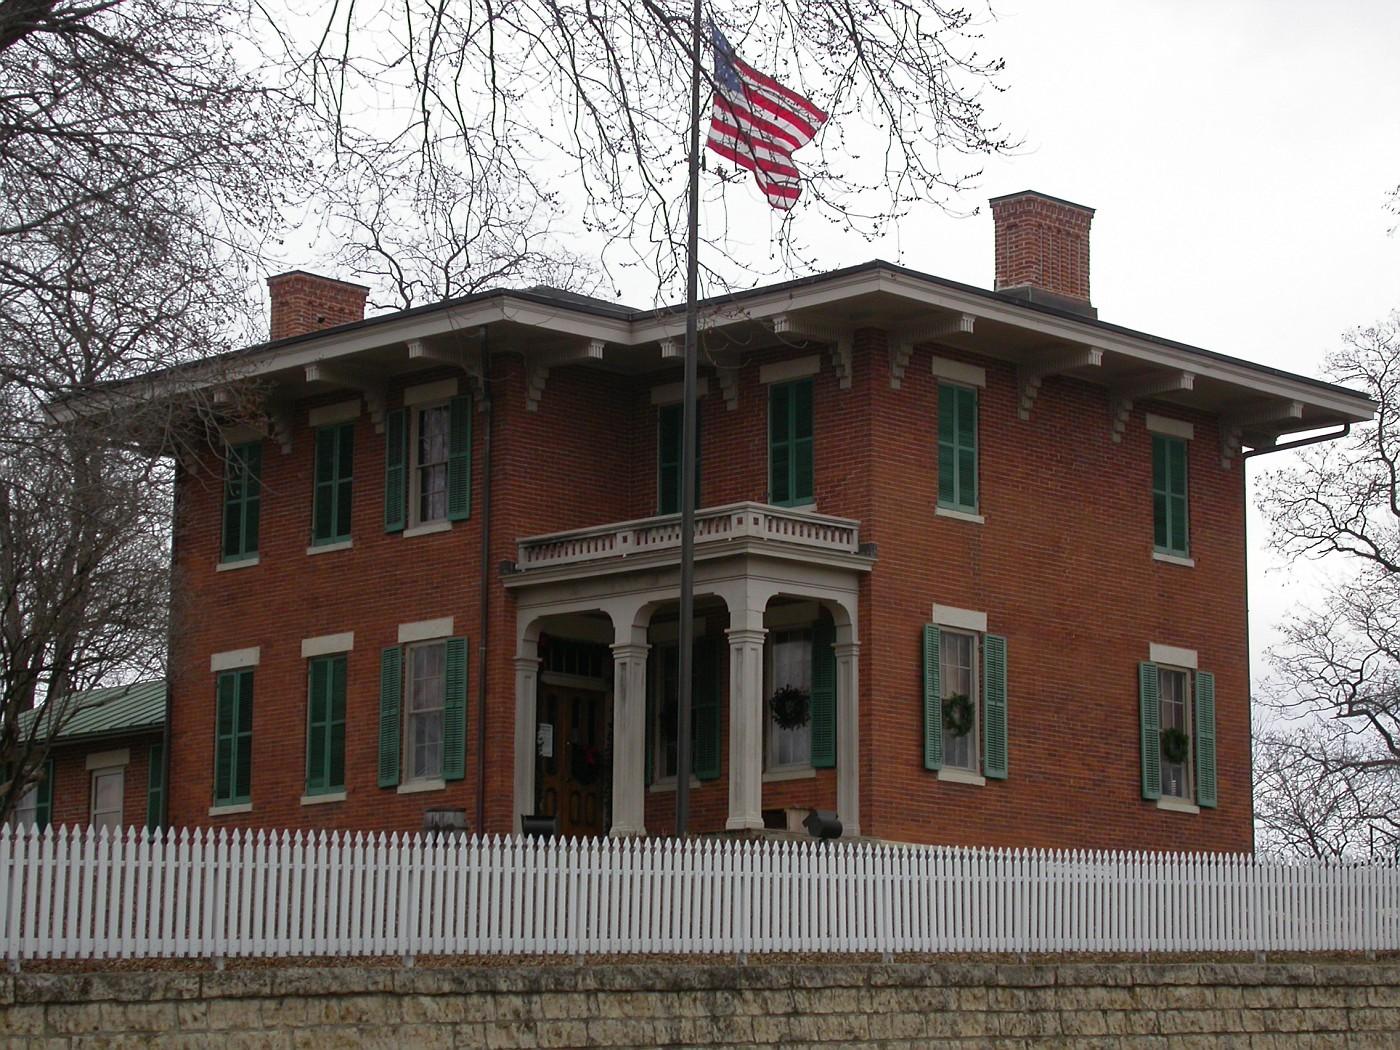 Grant's home